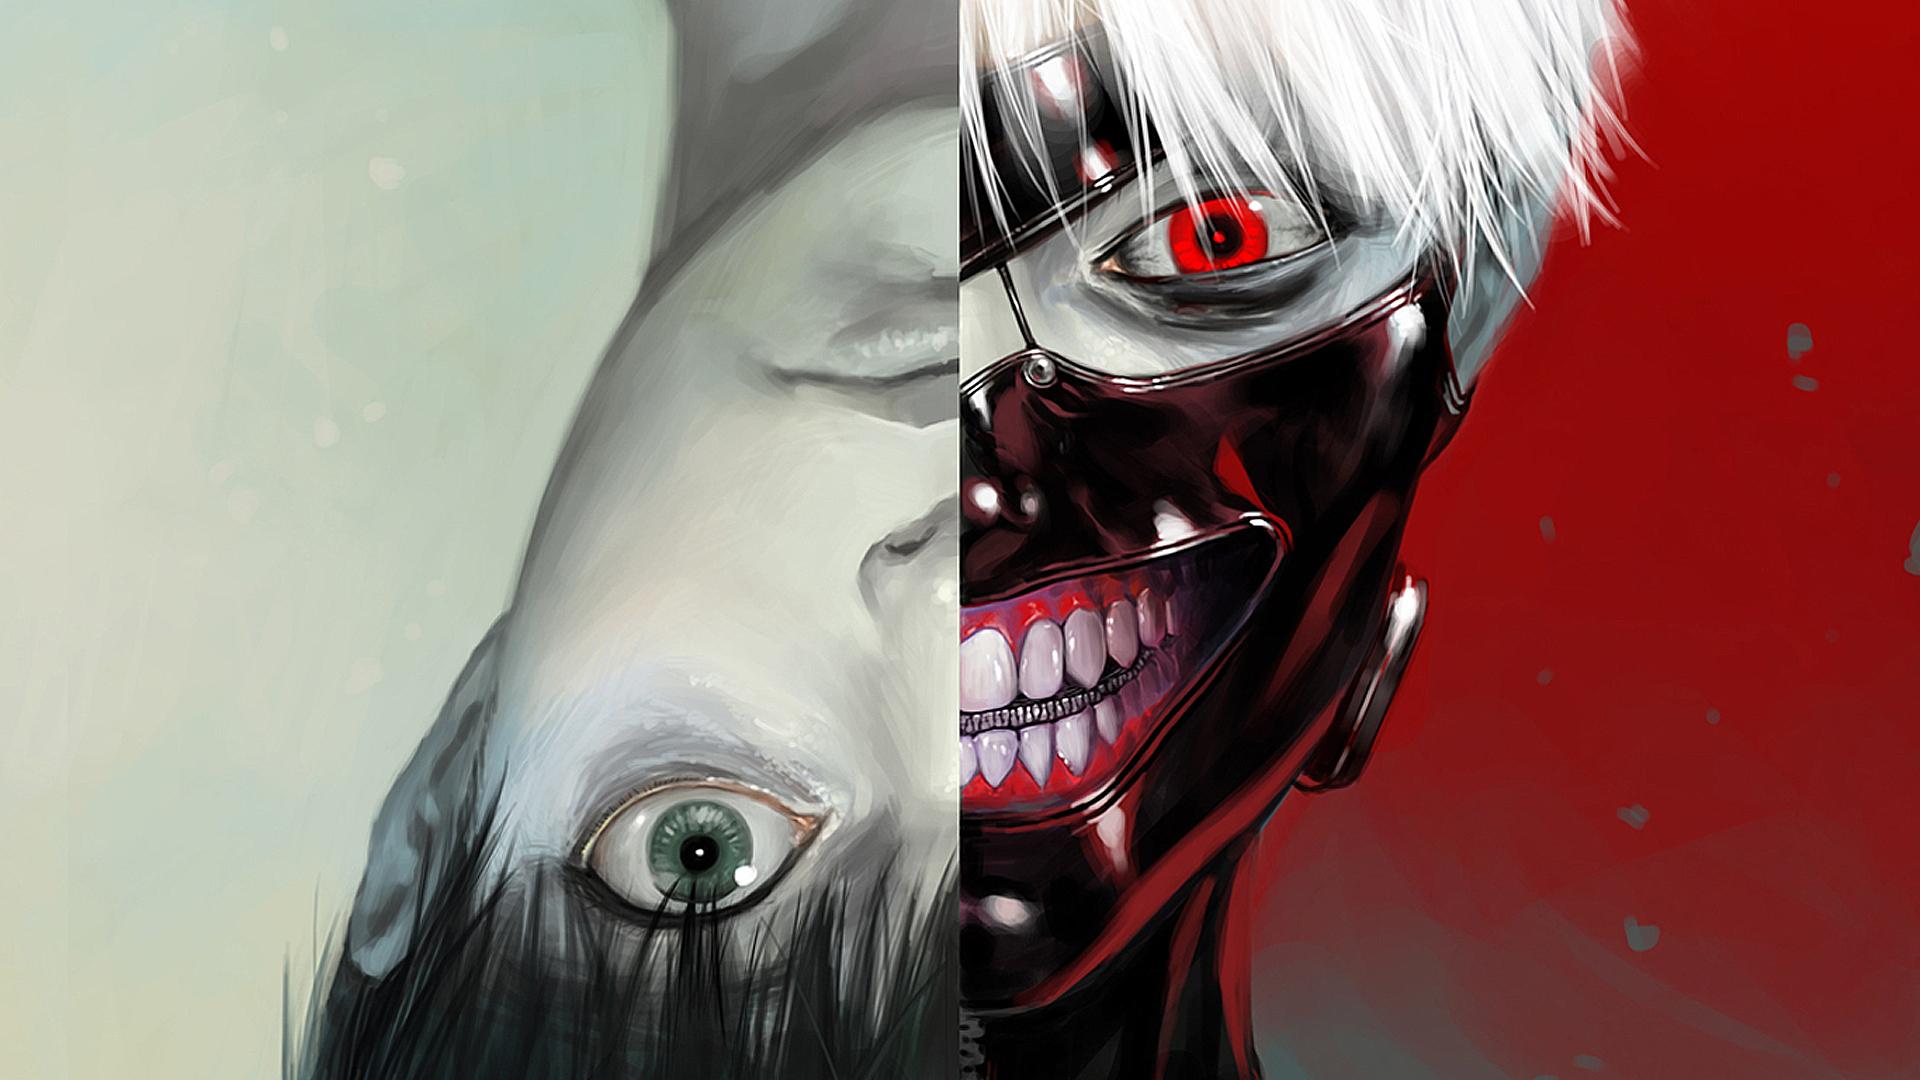 Ken Kaneki Tokyo Ghoul Anime mask HD 1920x1080 1080p wallpaper and 1920x1080